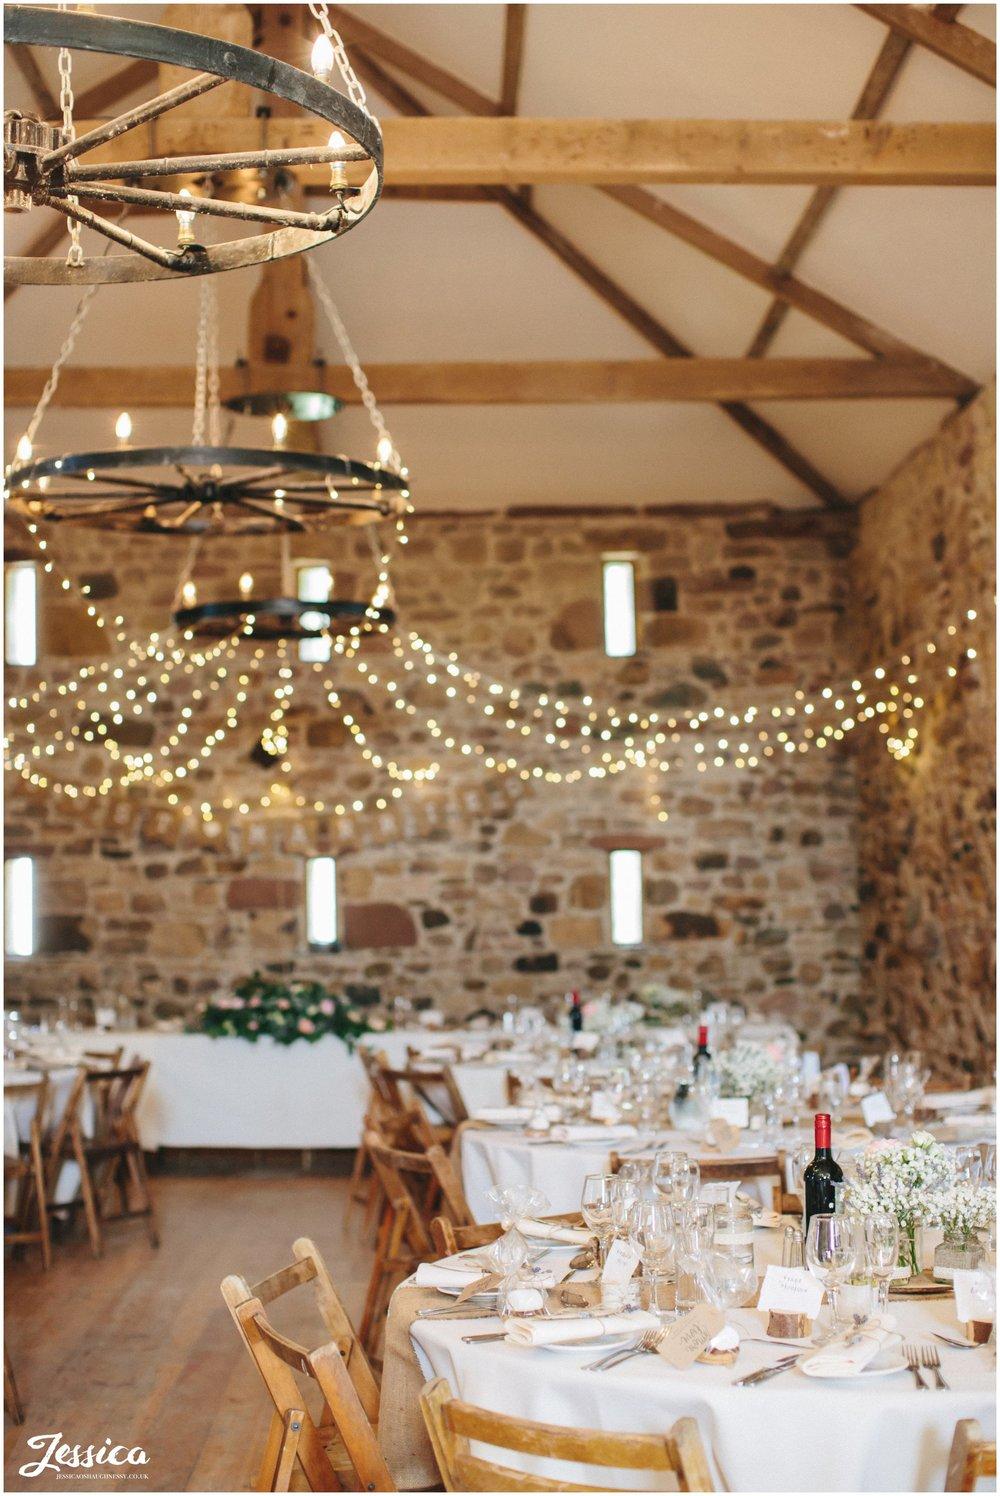 Barn dressed in rustic wedding decorations, cumbria wedding photographer